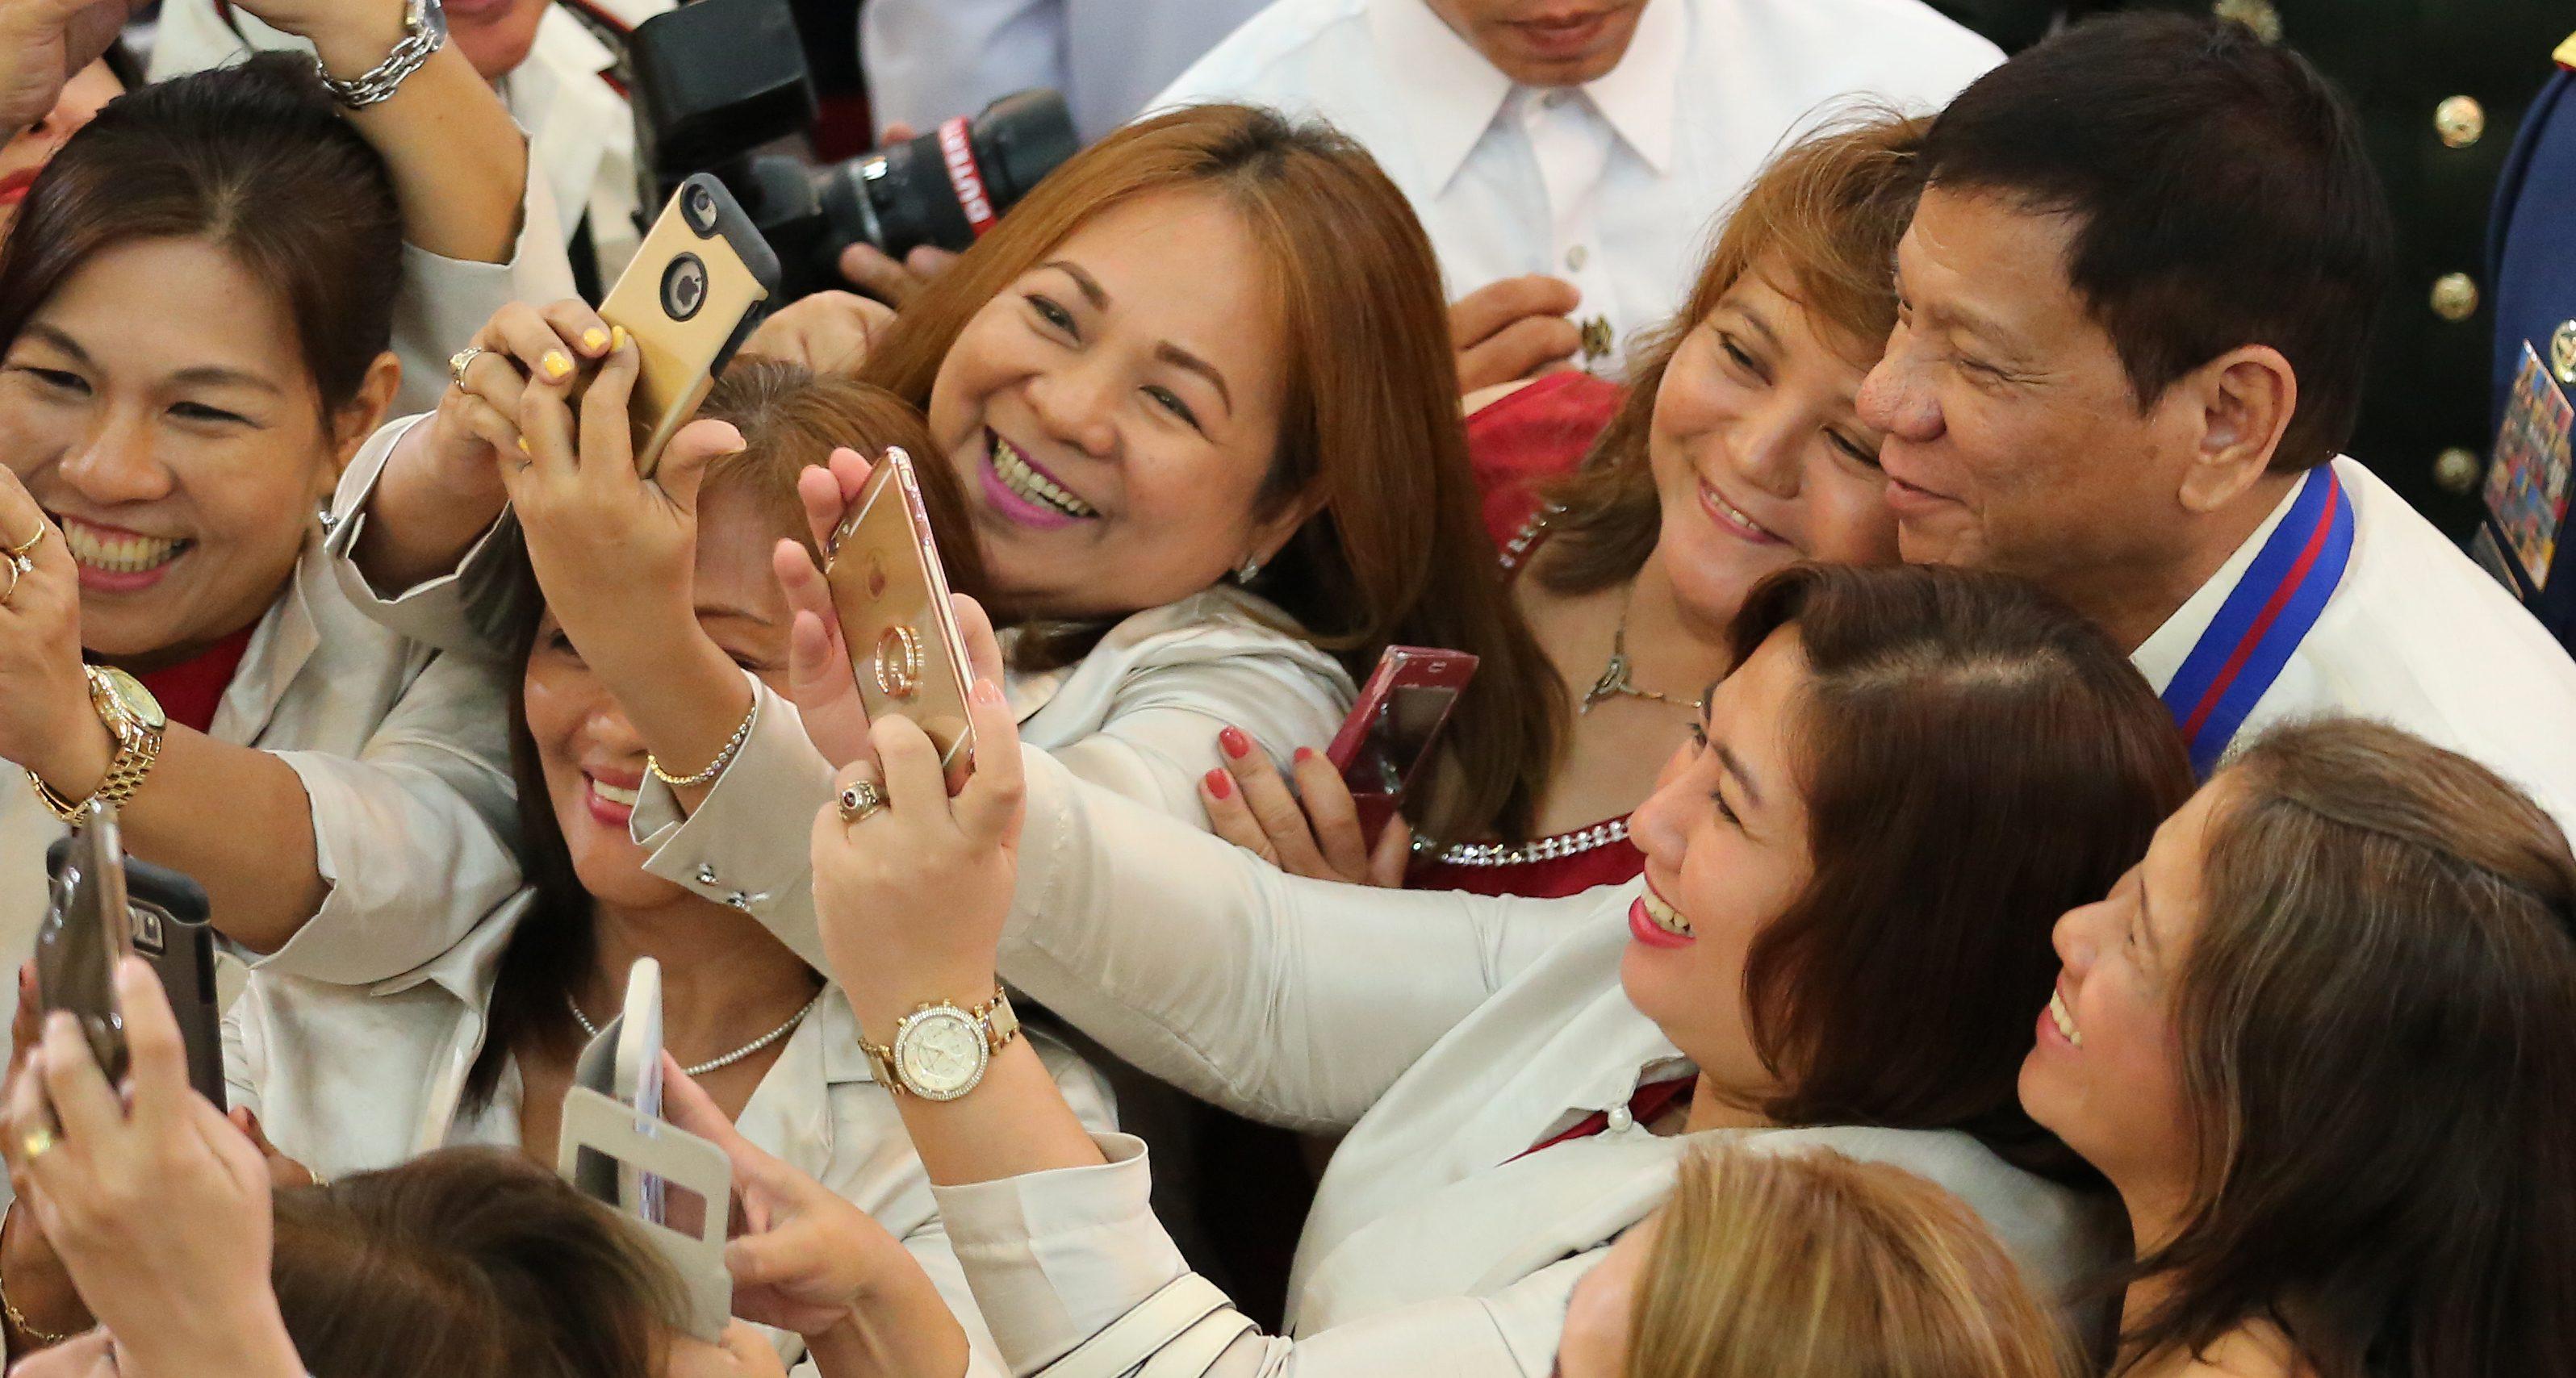 Women take a selfie with Philippine president Rodrigo Duterte in suburban Quezon city, Manila, Philippines, on July 1, 2016.